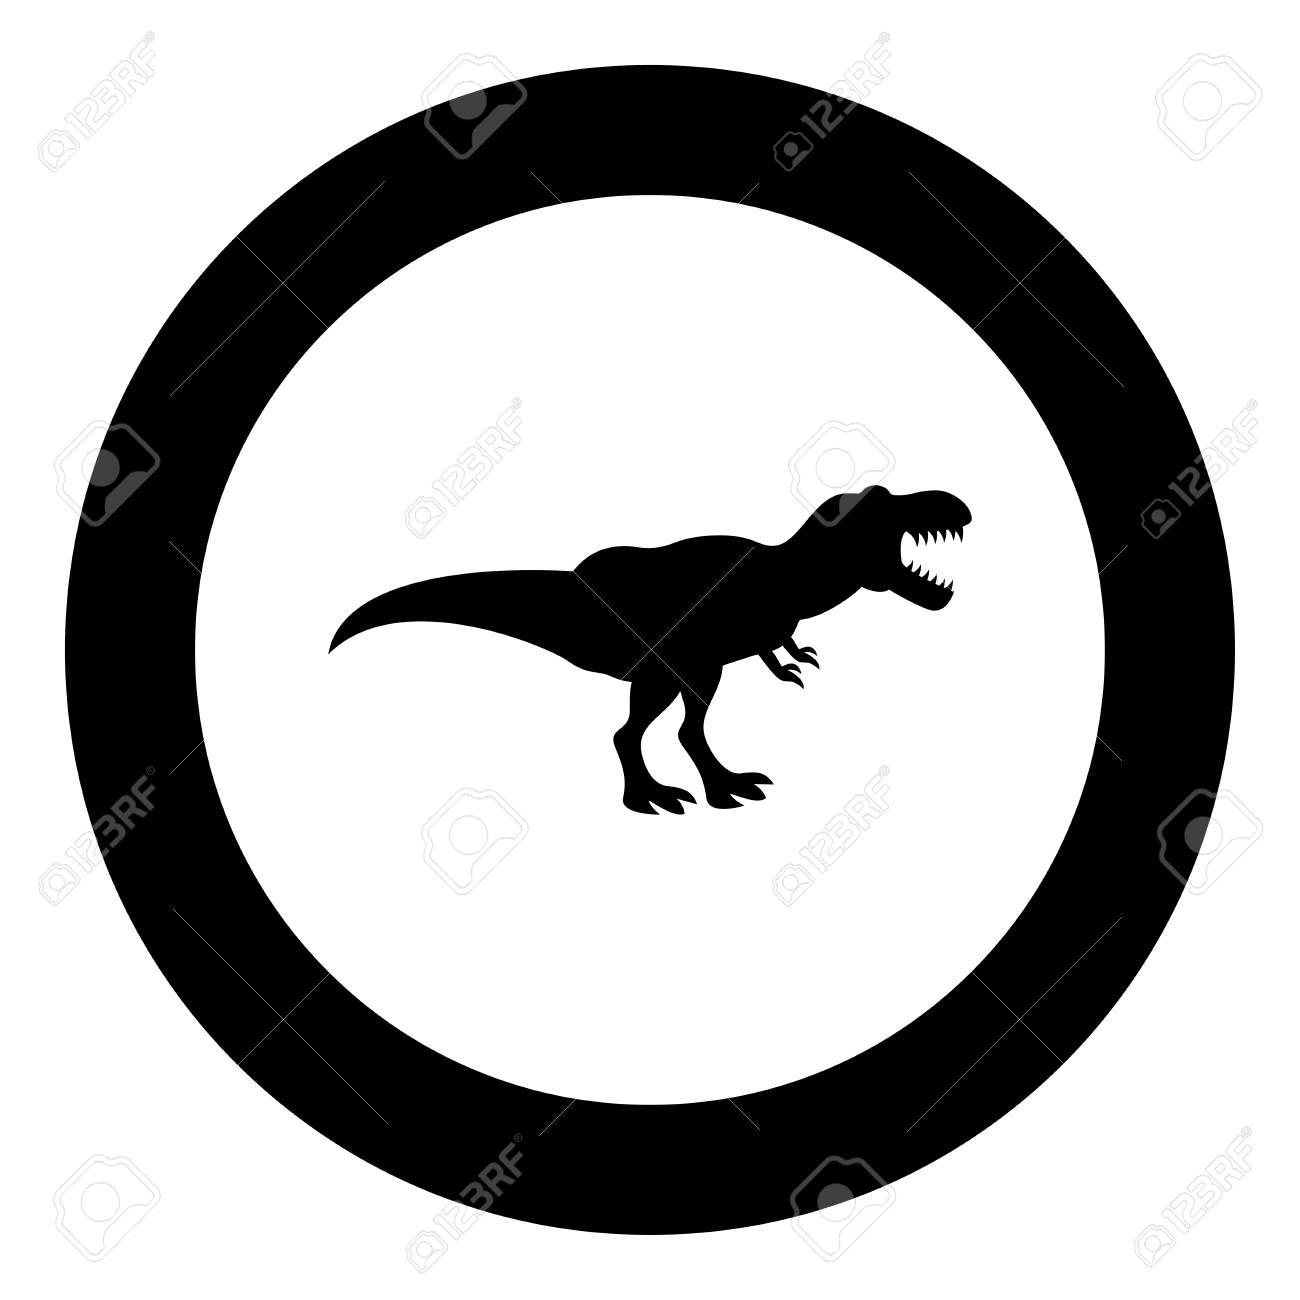 Dinosaur tyrannosaurus t rex icon black color in circle round vector illustration - 102869114